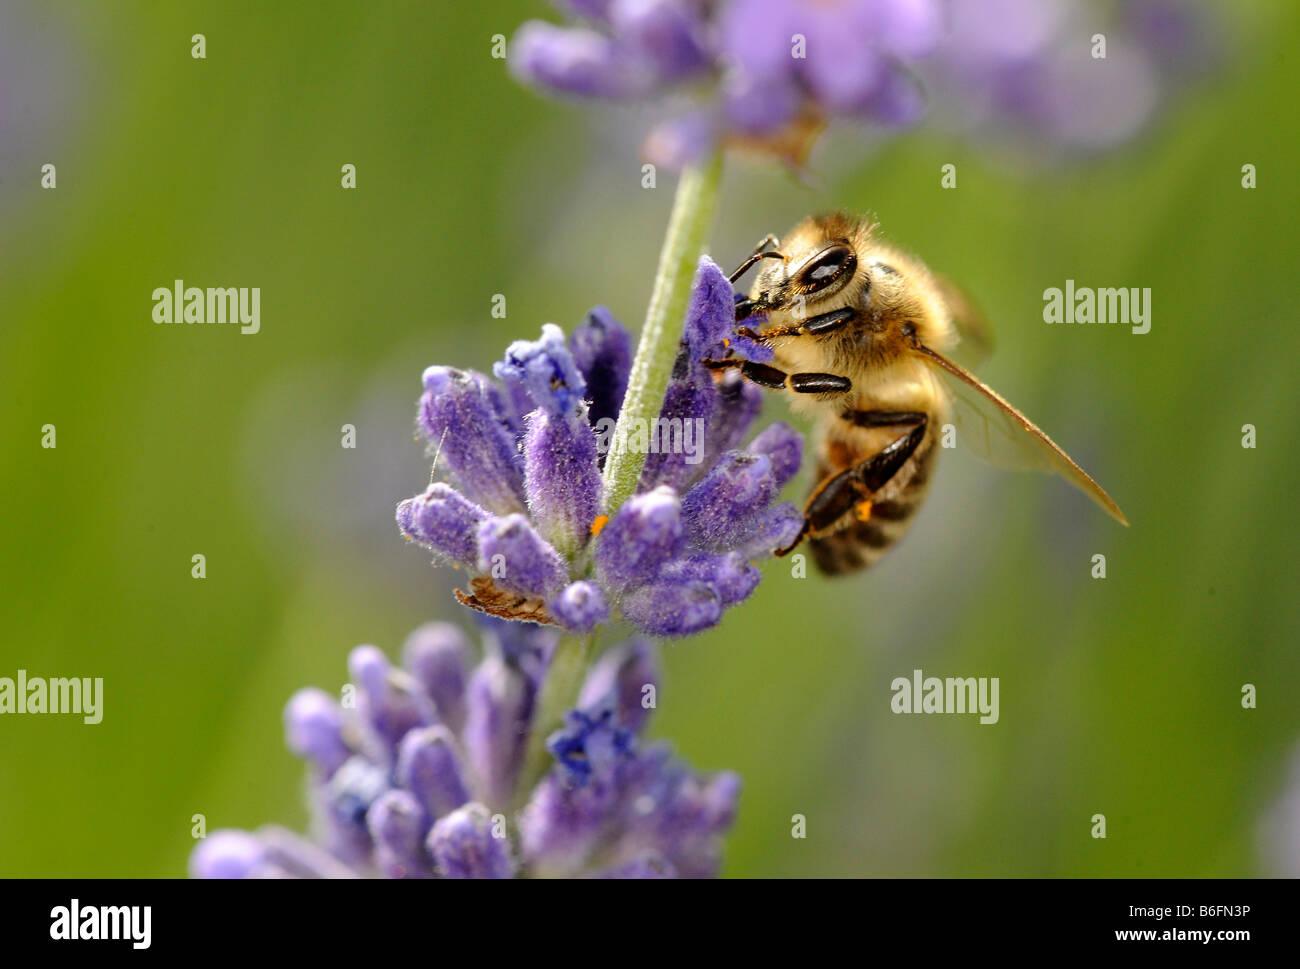 European Honey Bee or Western Honey Bee (Apis mellifera) looking for food on True or English lavender (Lavandula - Stock Image